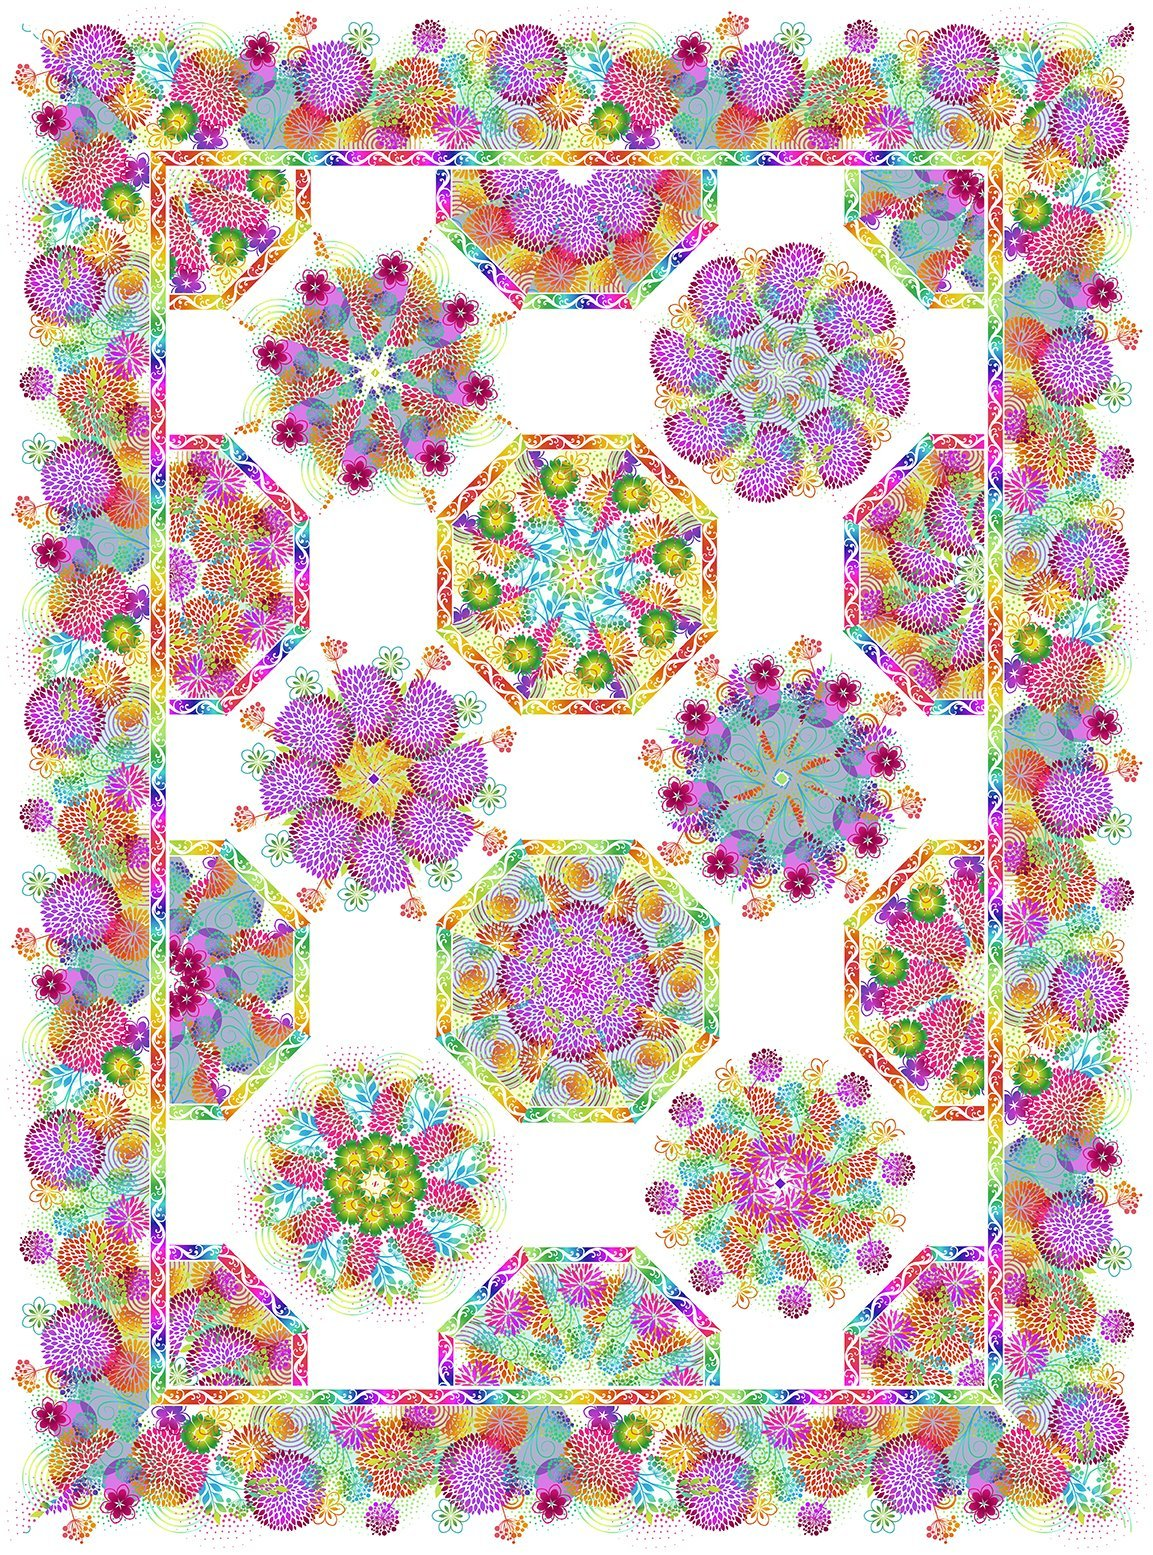 In The Beginning - Unusual Garden II - One-Fabric Kaleidoscope Quilt Kit - WHITE